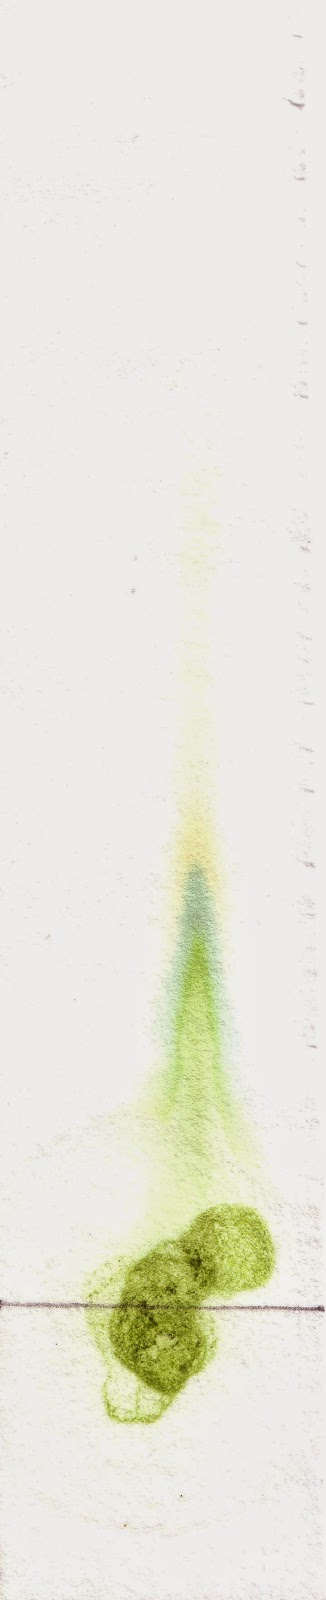 Cromatograma de clorofila bruta